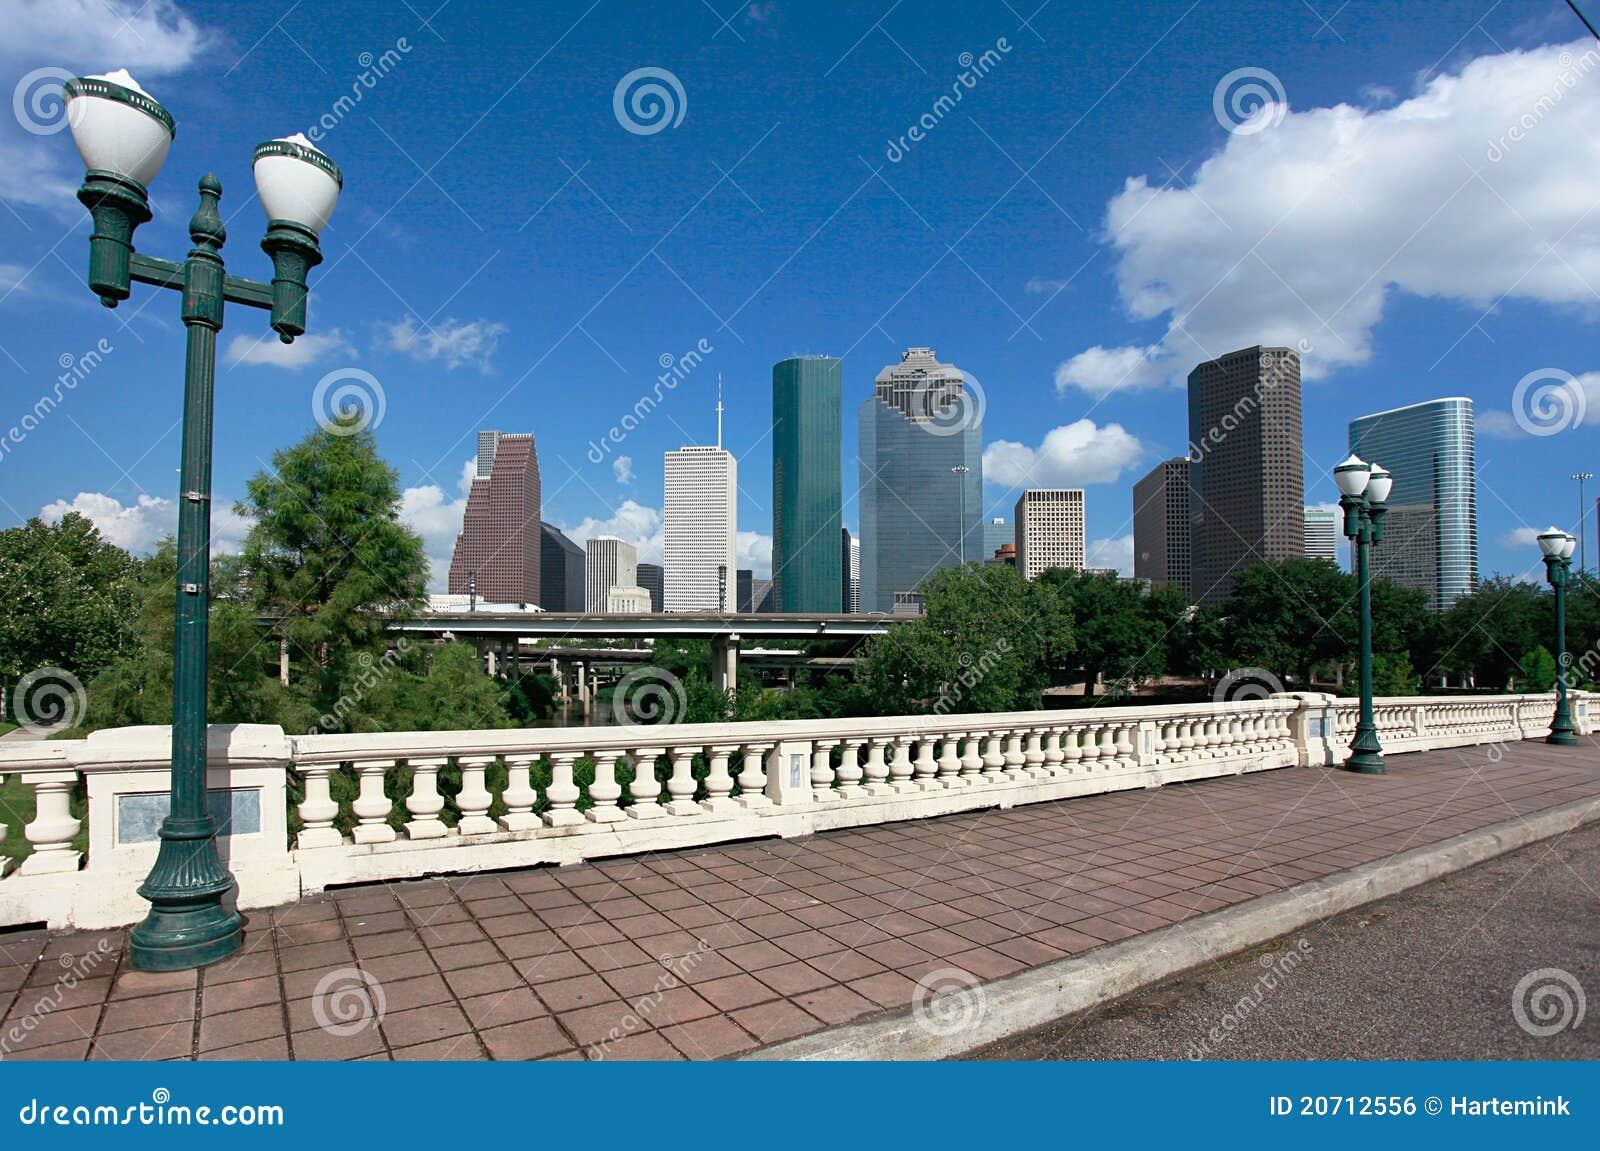 Houston skyline as seen from Sabine Street Bridge